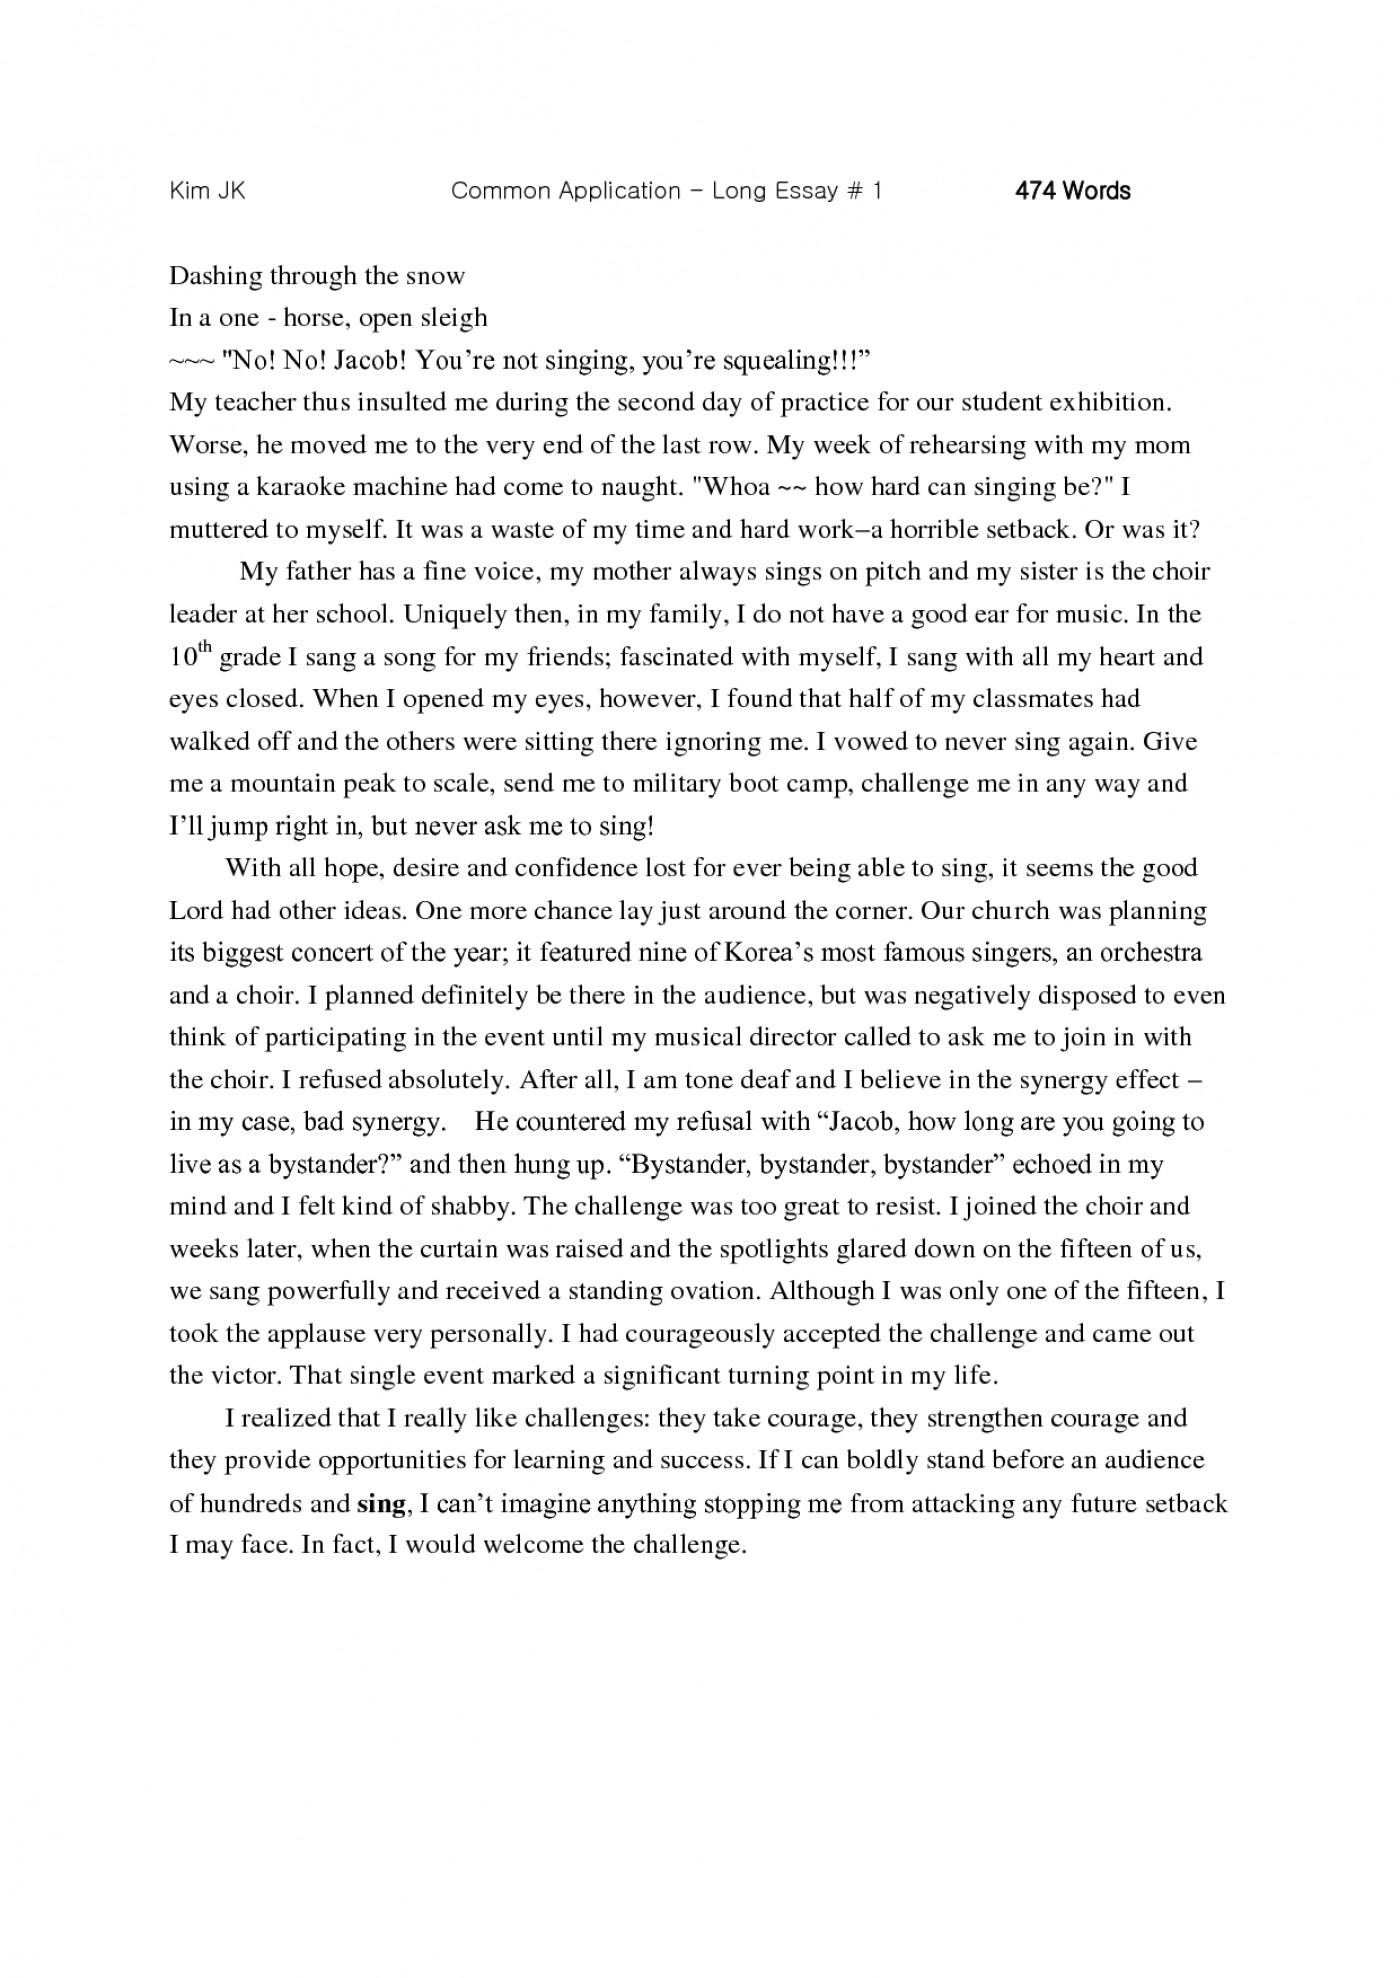 001 College Essay Word Limit Good Common App Essays Resume Writing Application Help Cnessayjuvi Impressive Apply Texas 2019 1400